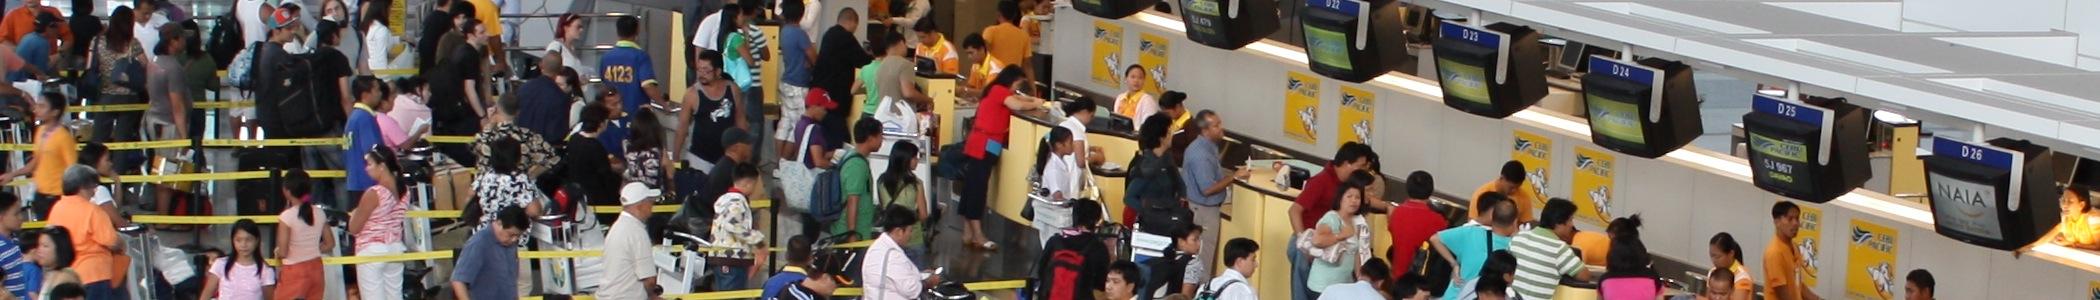 Ninoy Aquino International Airport – Travel guide at Wikivoyage